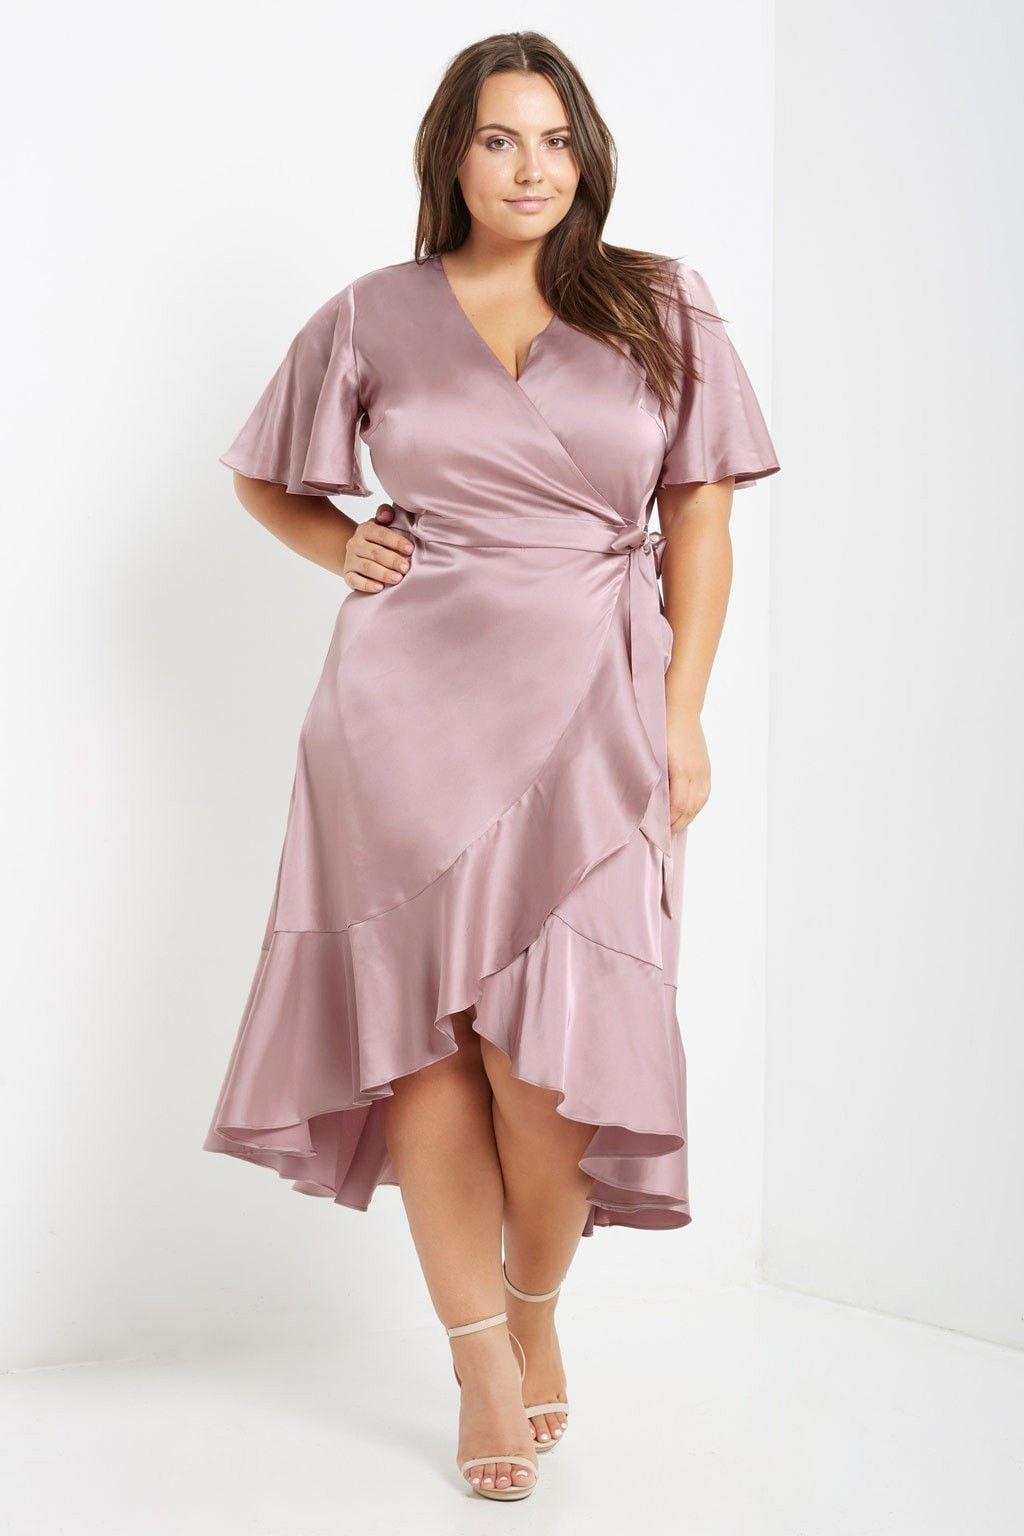 Dusty Pink Satin Wrap Midi Dress Plus Size in 2019  8f655ba2237e